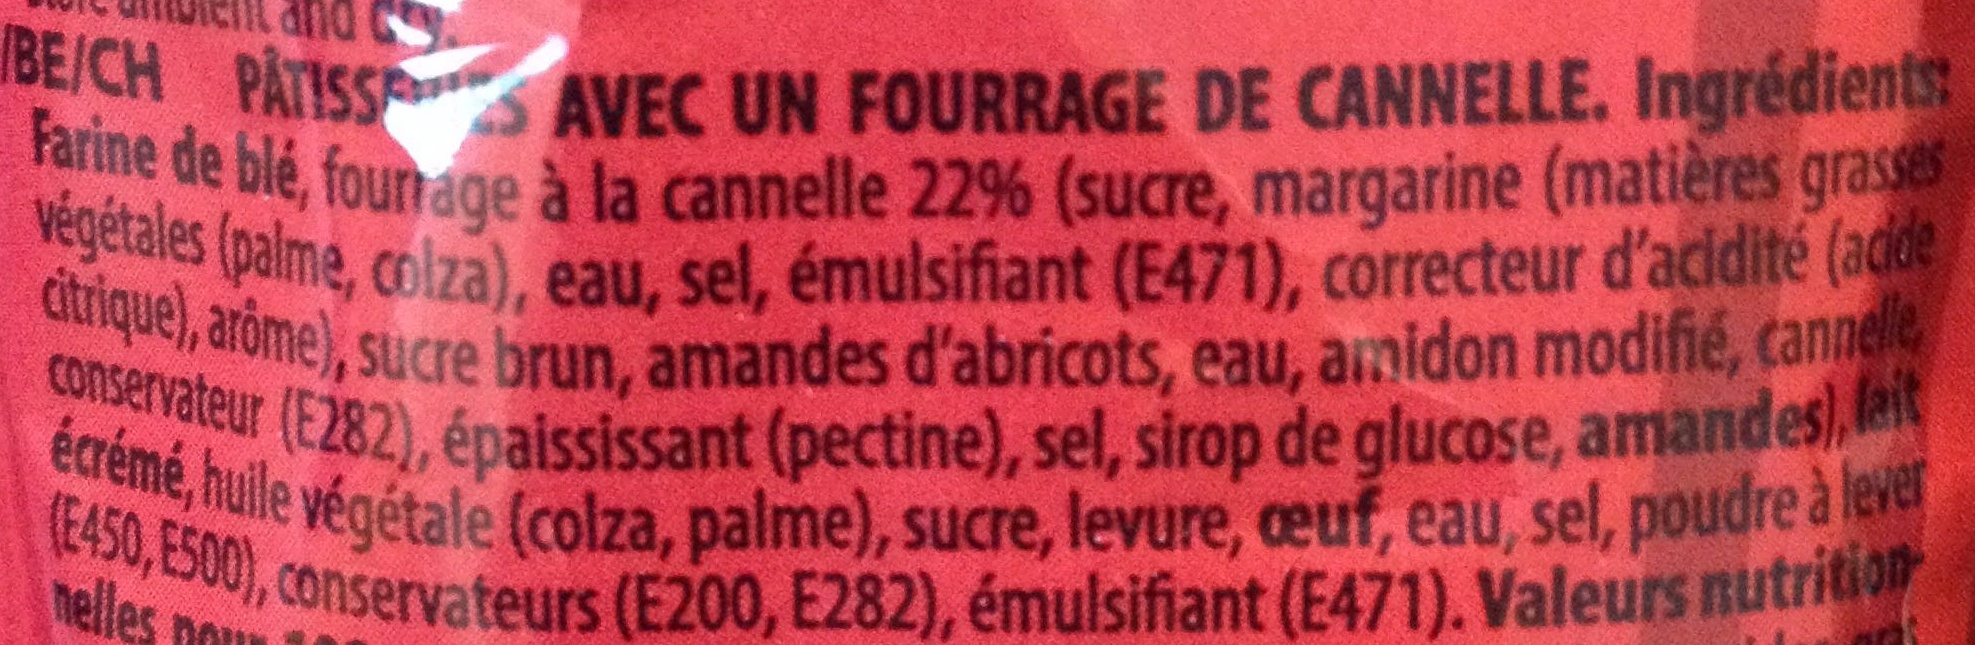 Gifflar cannelle zimt - Ingrédients - fr